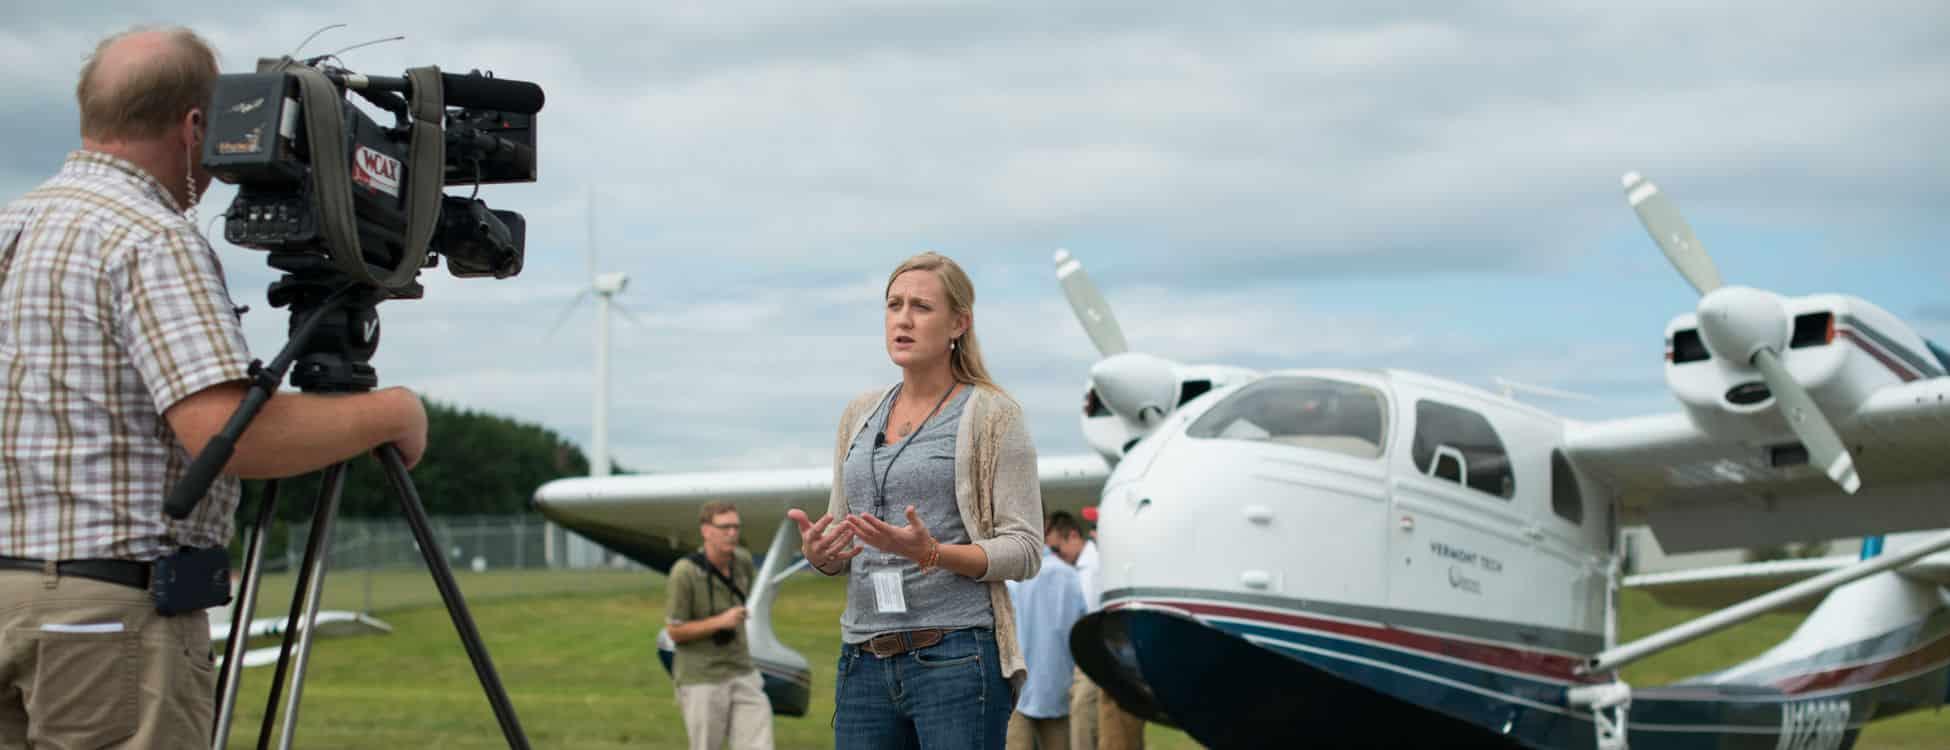 female student, professional pilot technology, sea plane, press conference